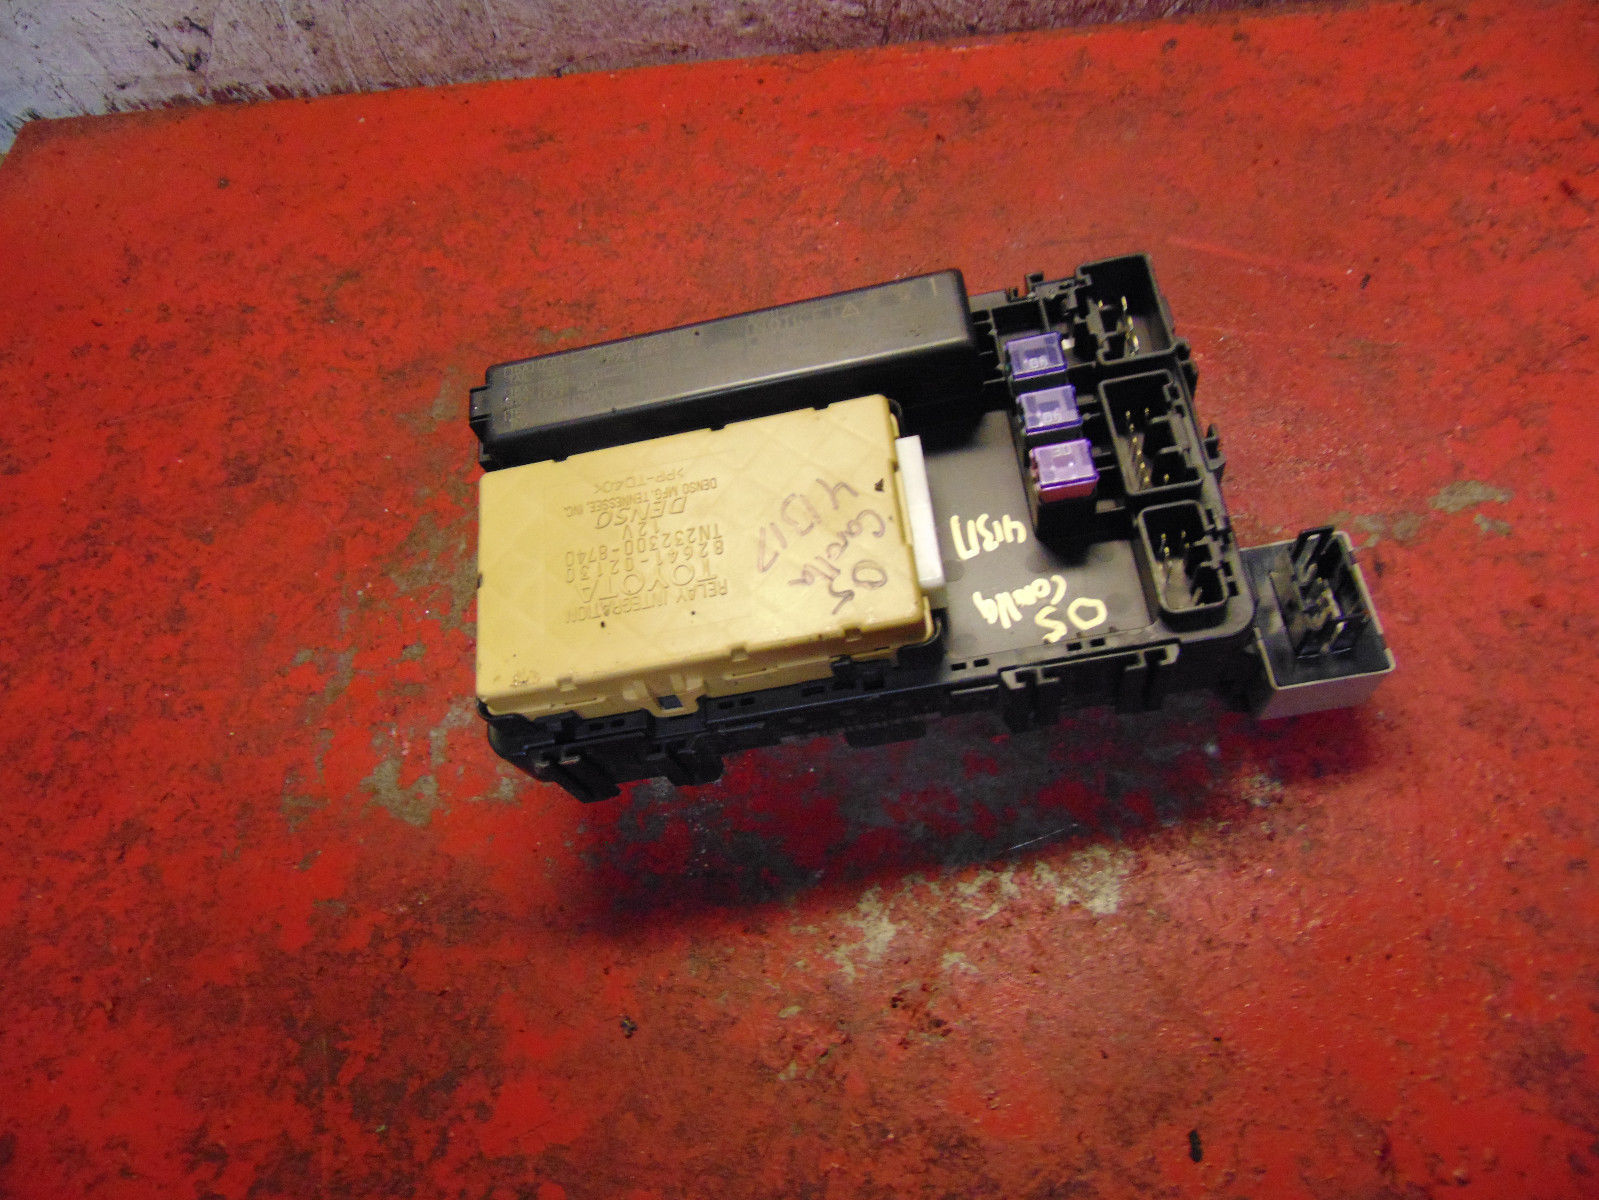 06 toyota corolla fuse box toyota corolla fuse box 2010 03 04 08 07 06 05 toyota corolla interior fuse box panel ...